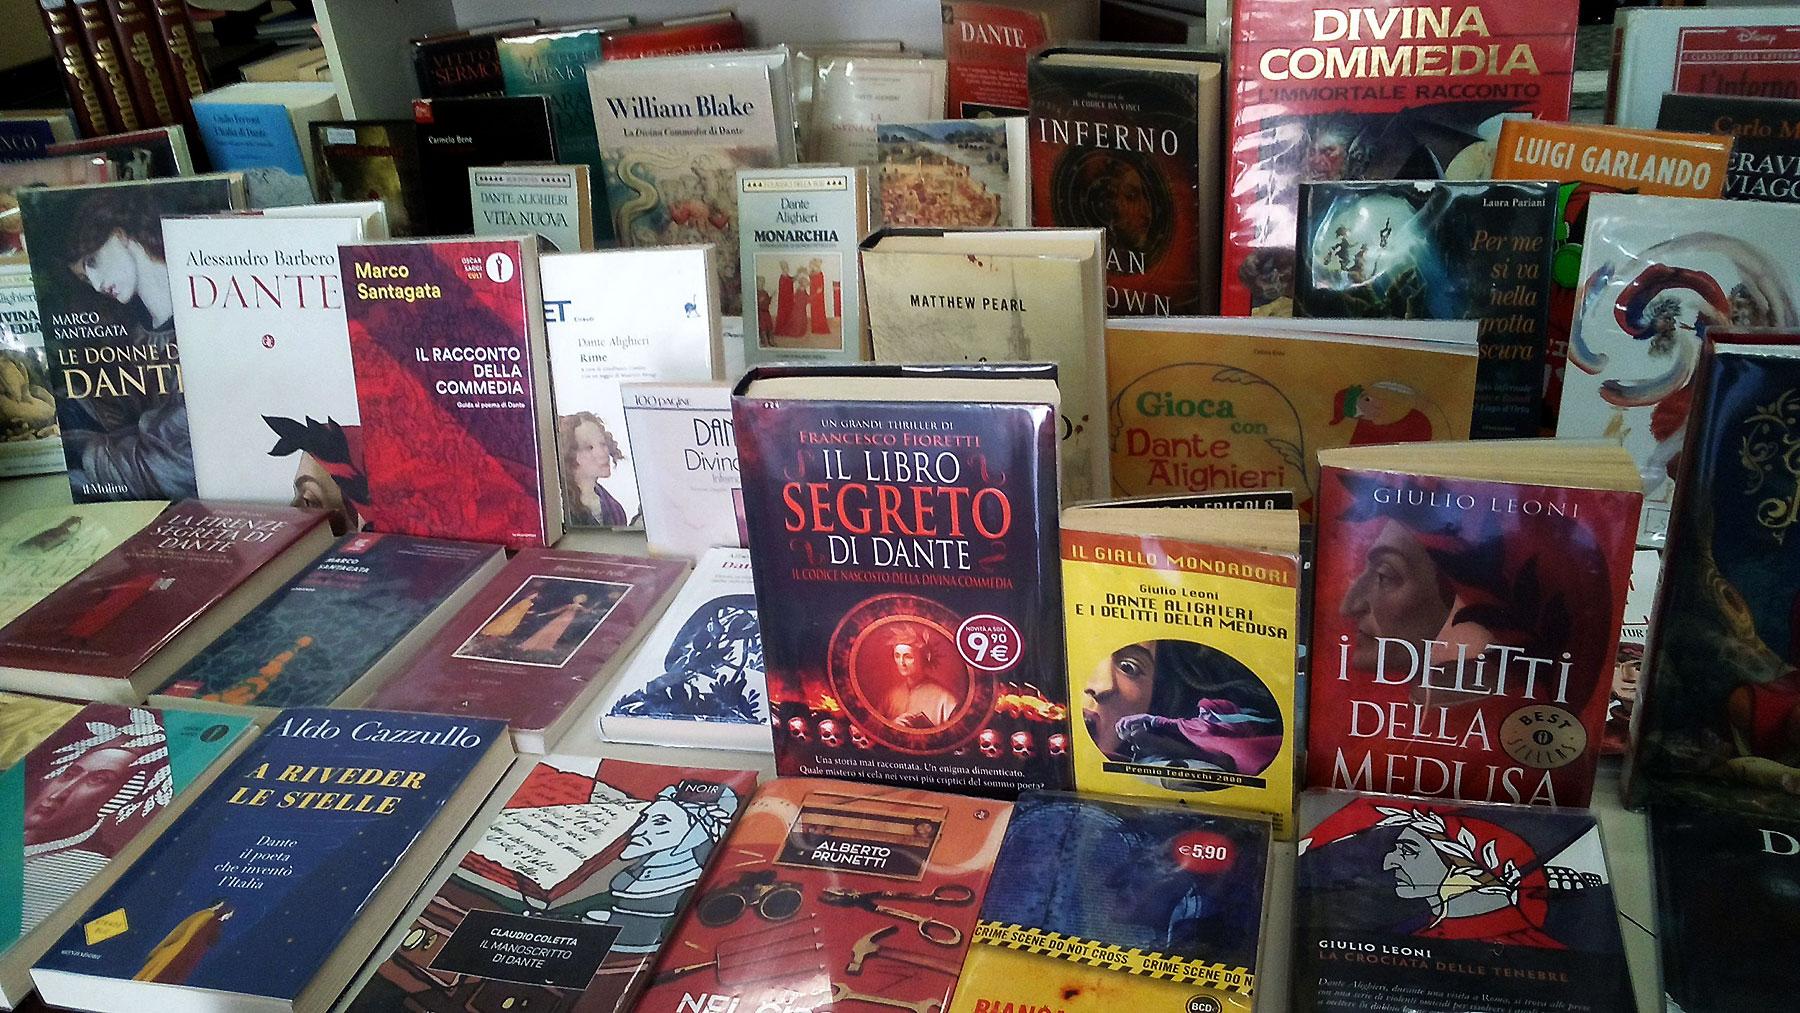 Mostra bibliografica dedicata a Dante.